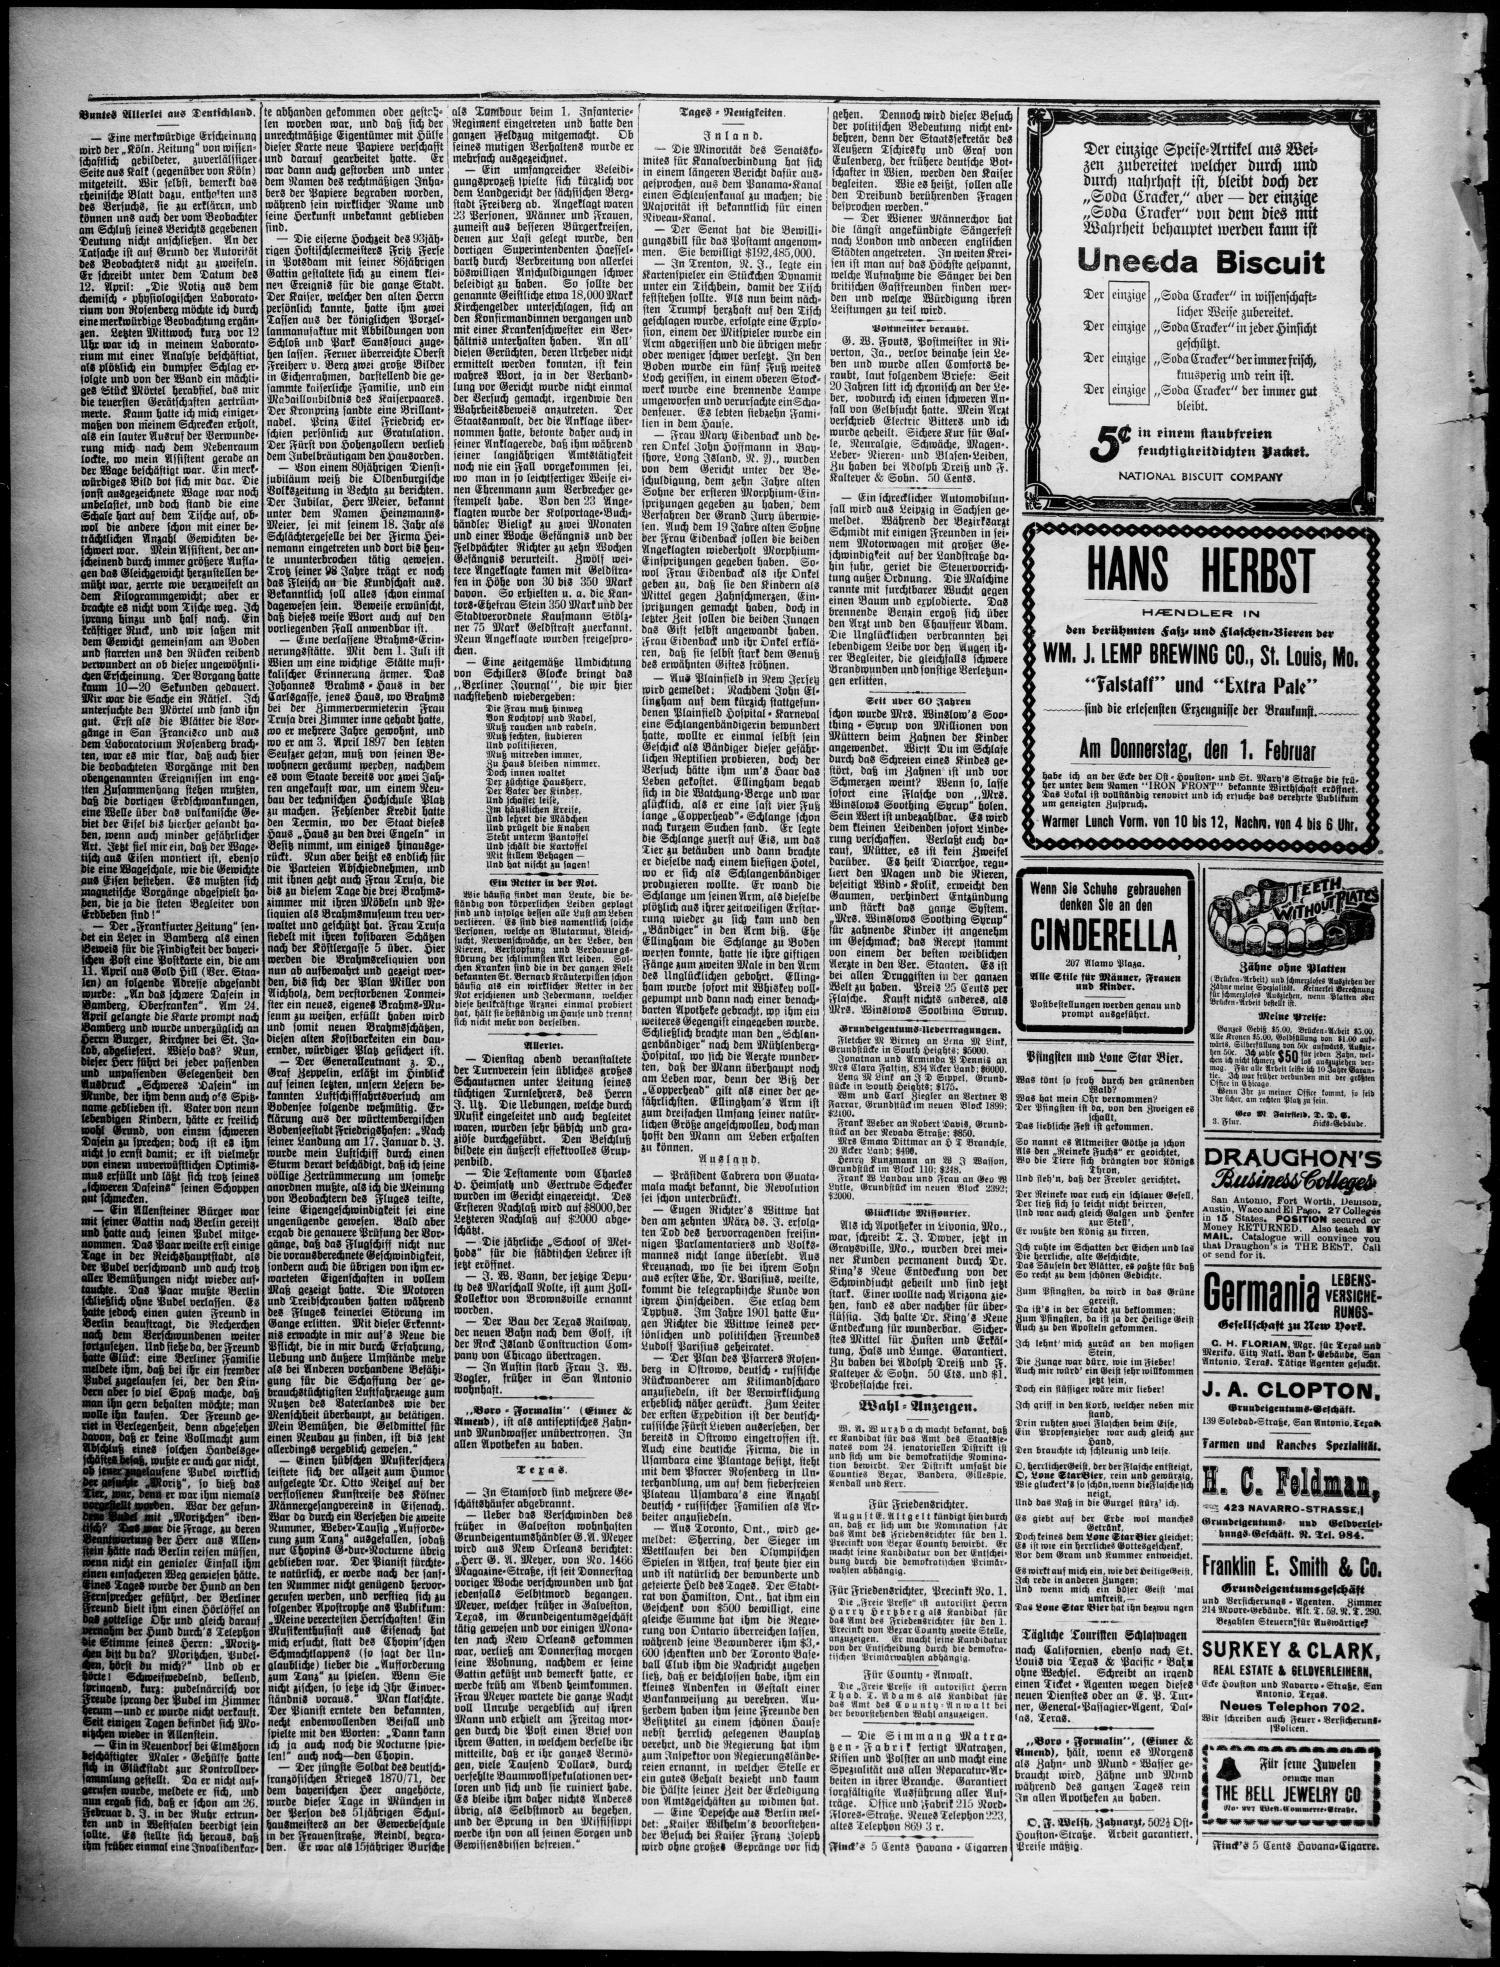 Freie Presse für Texas  (San Antonio, Tex ), Vol  42, No